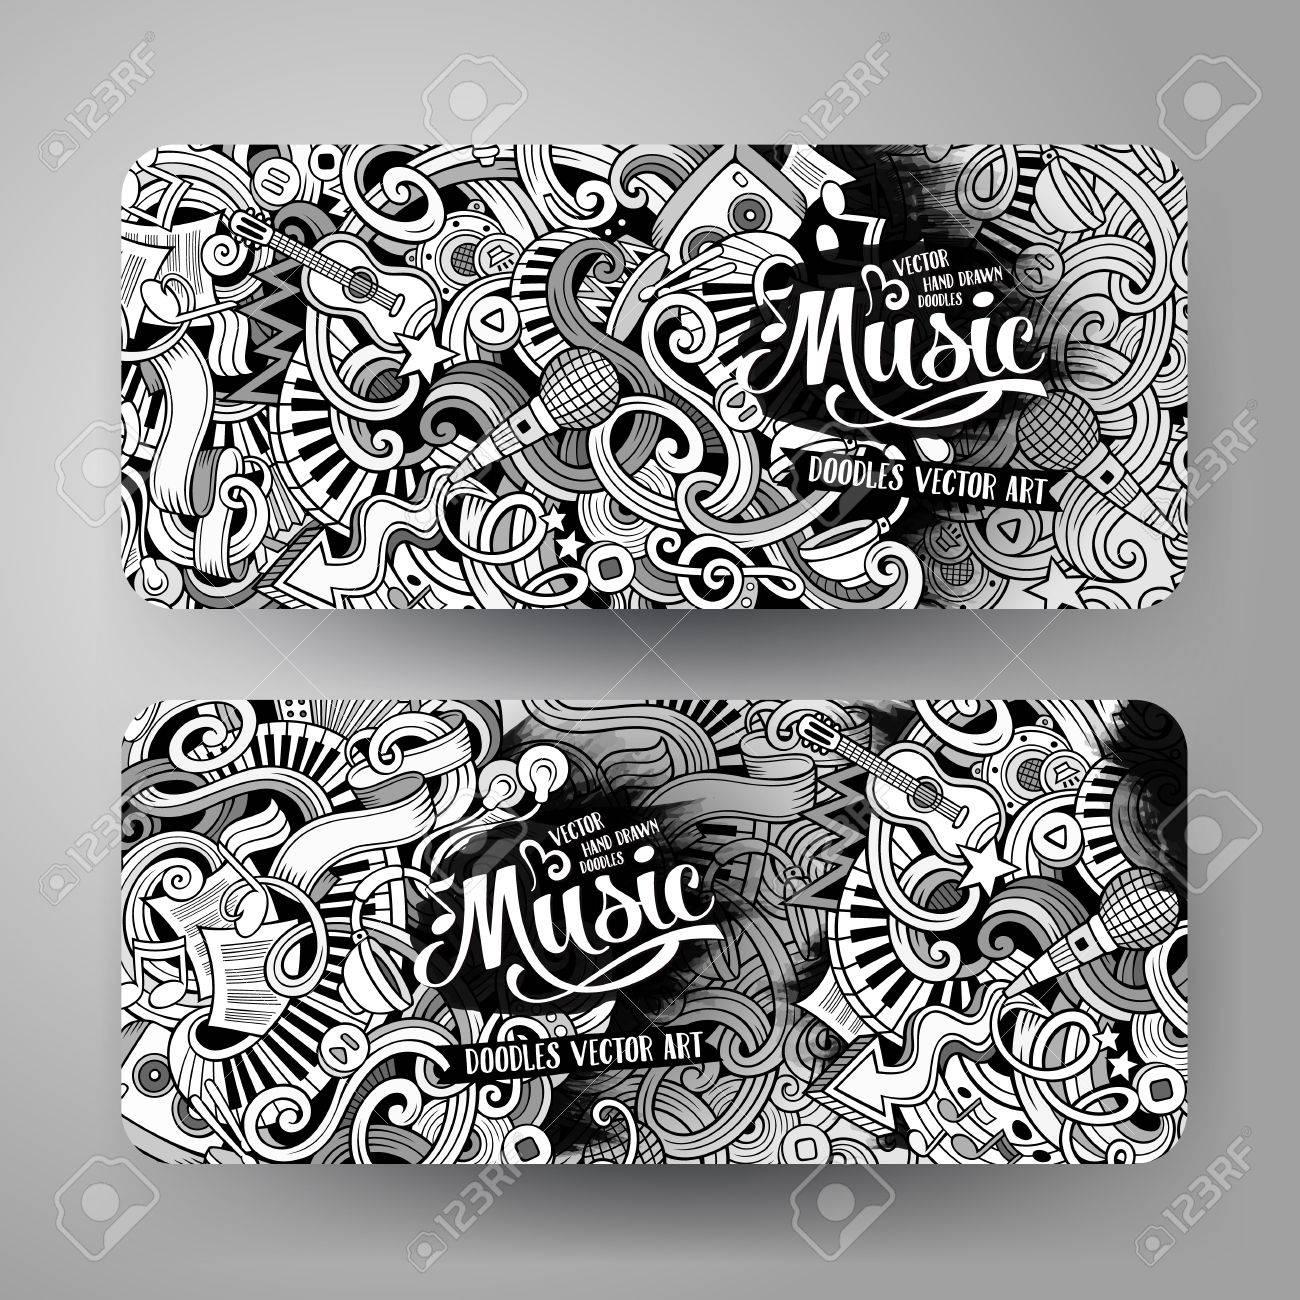 Cartoon line art vector hand drawn doodles music corporate identity. 2 Horizontal banners design. Templates set - 60242874